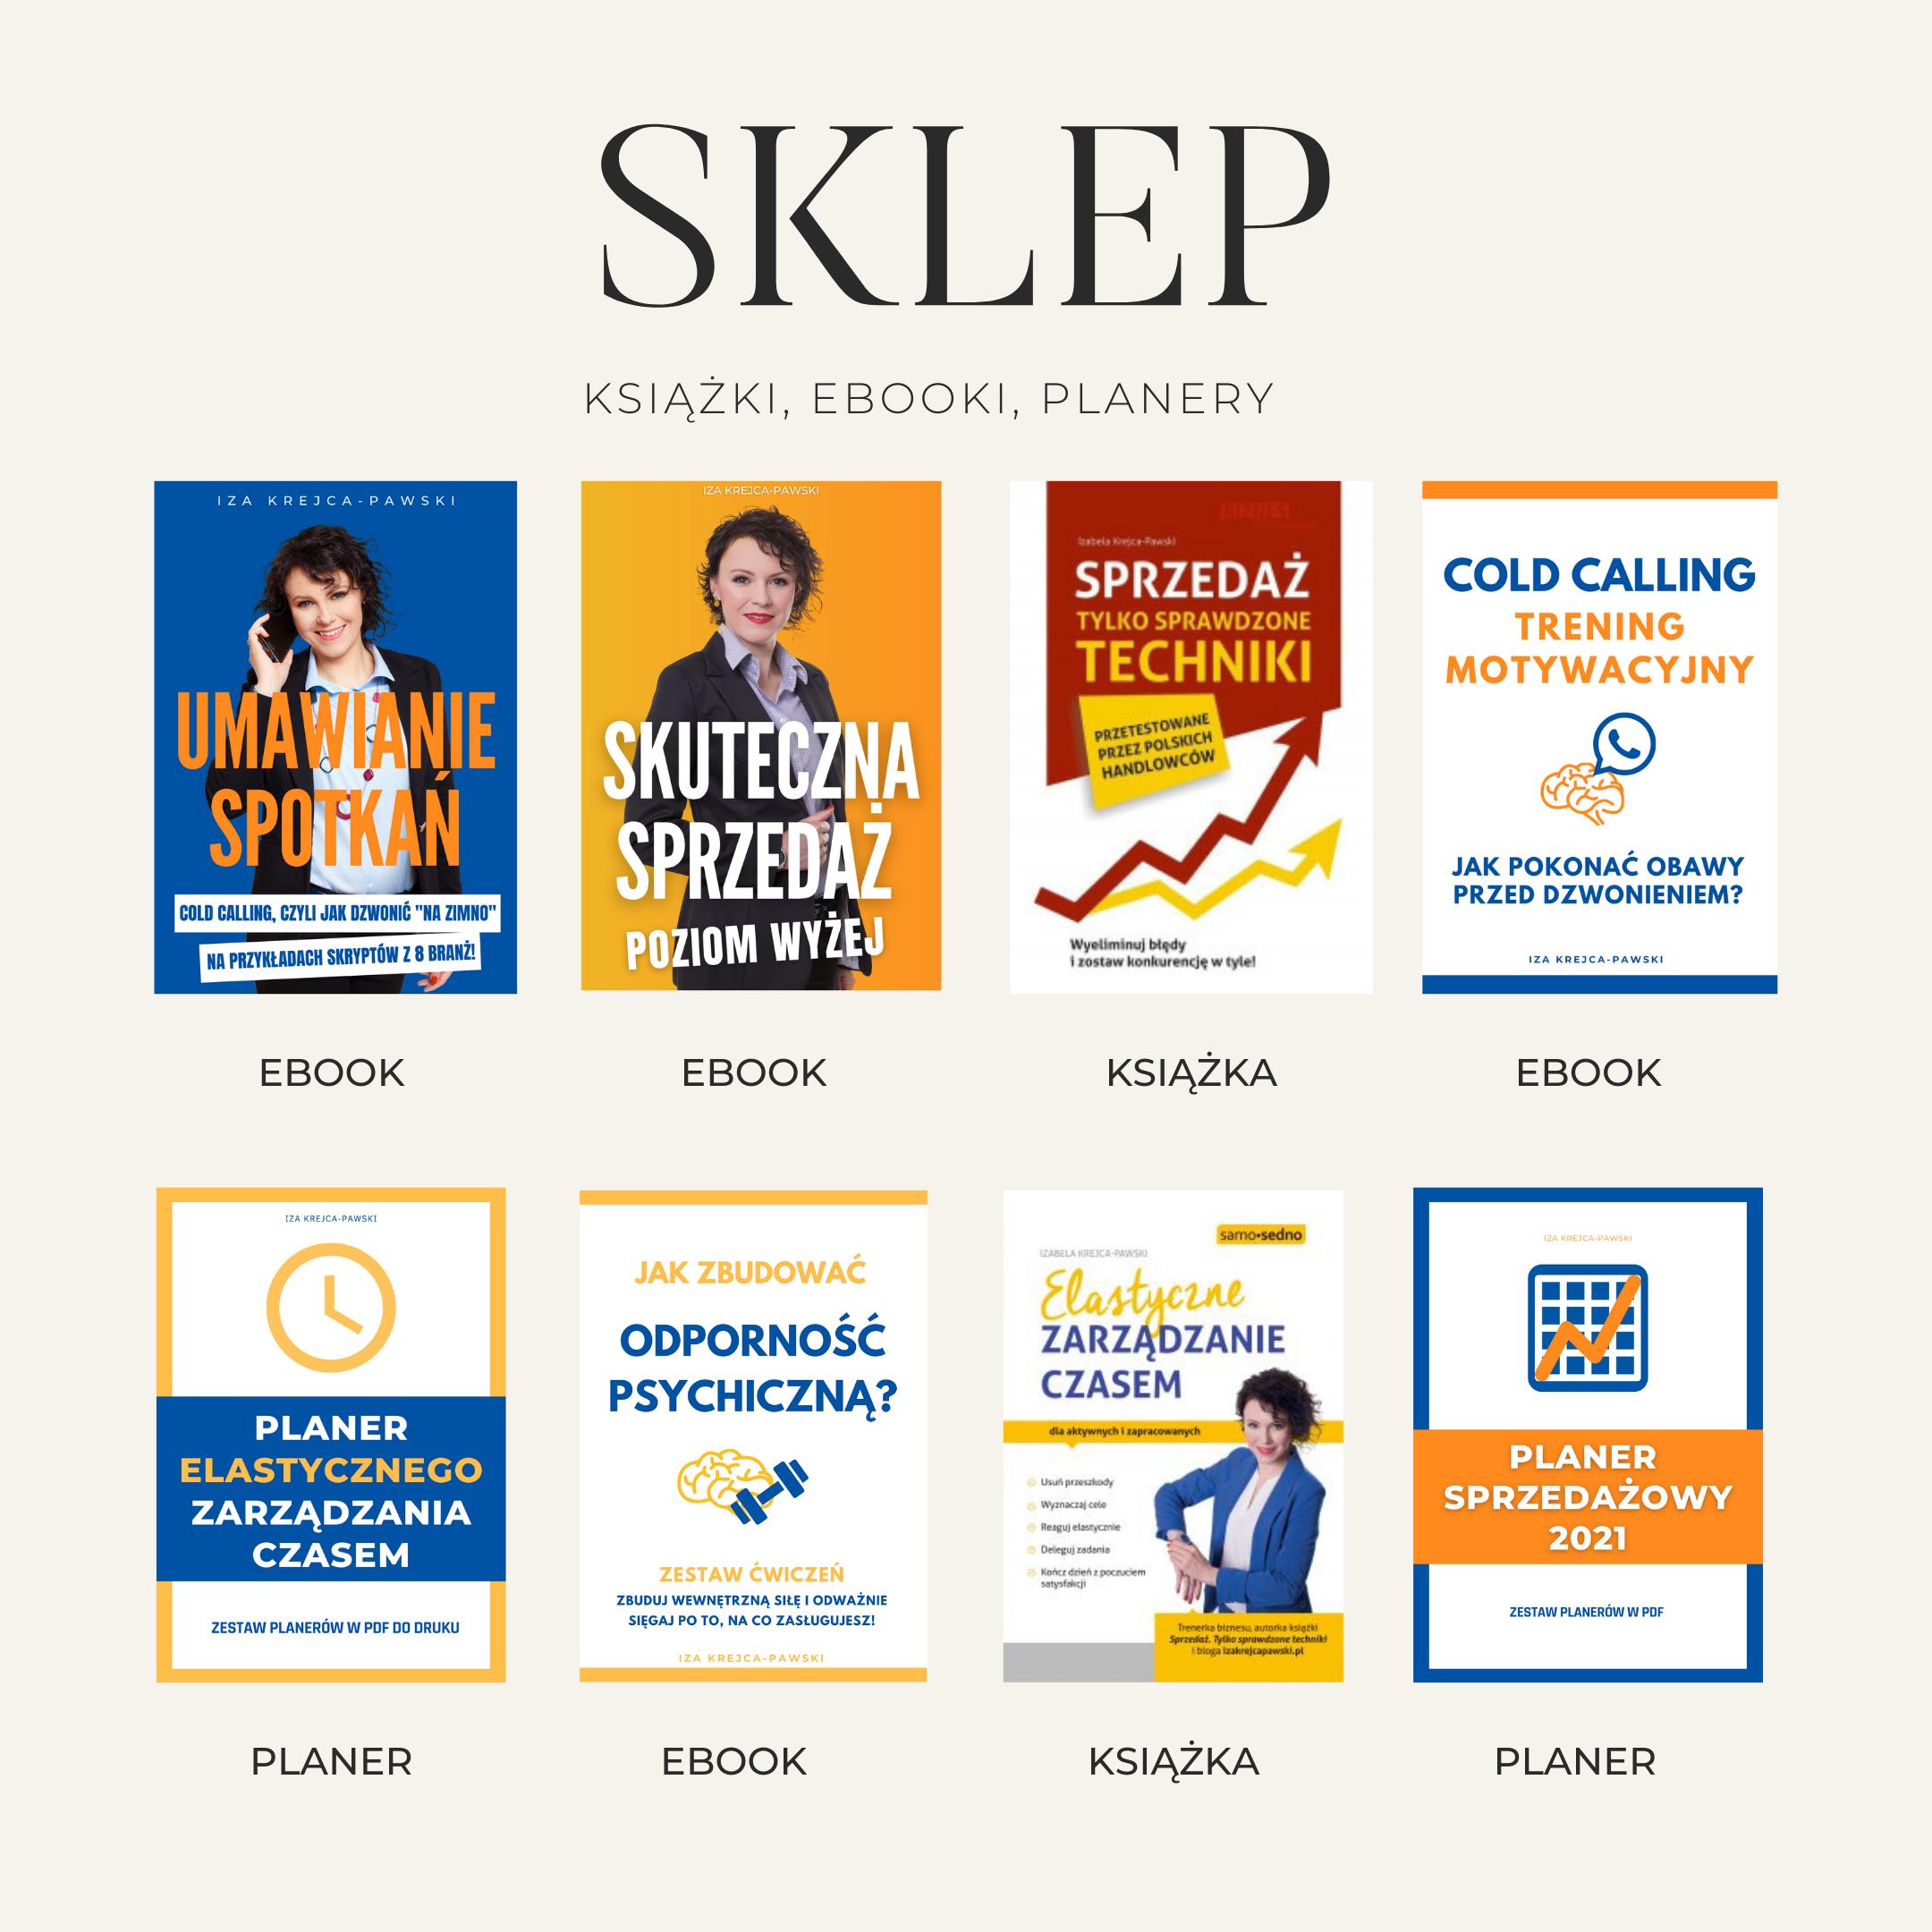 Sklep IKP ze skryptami eboookami książkami i szkoleniami